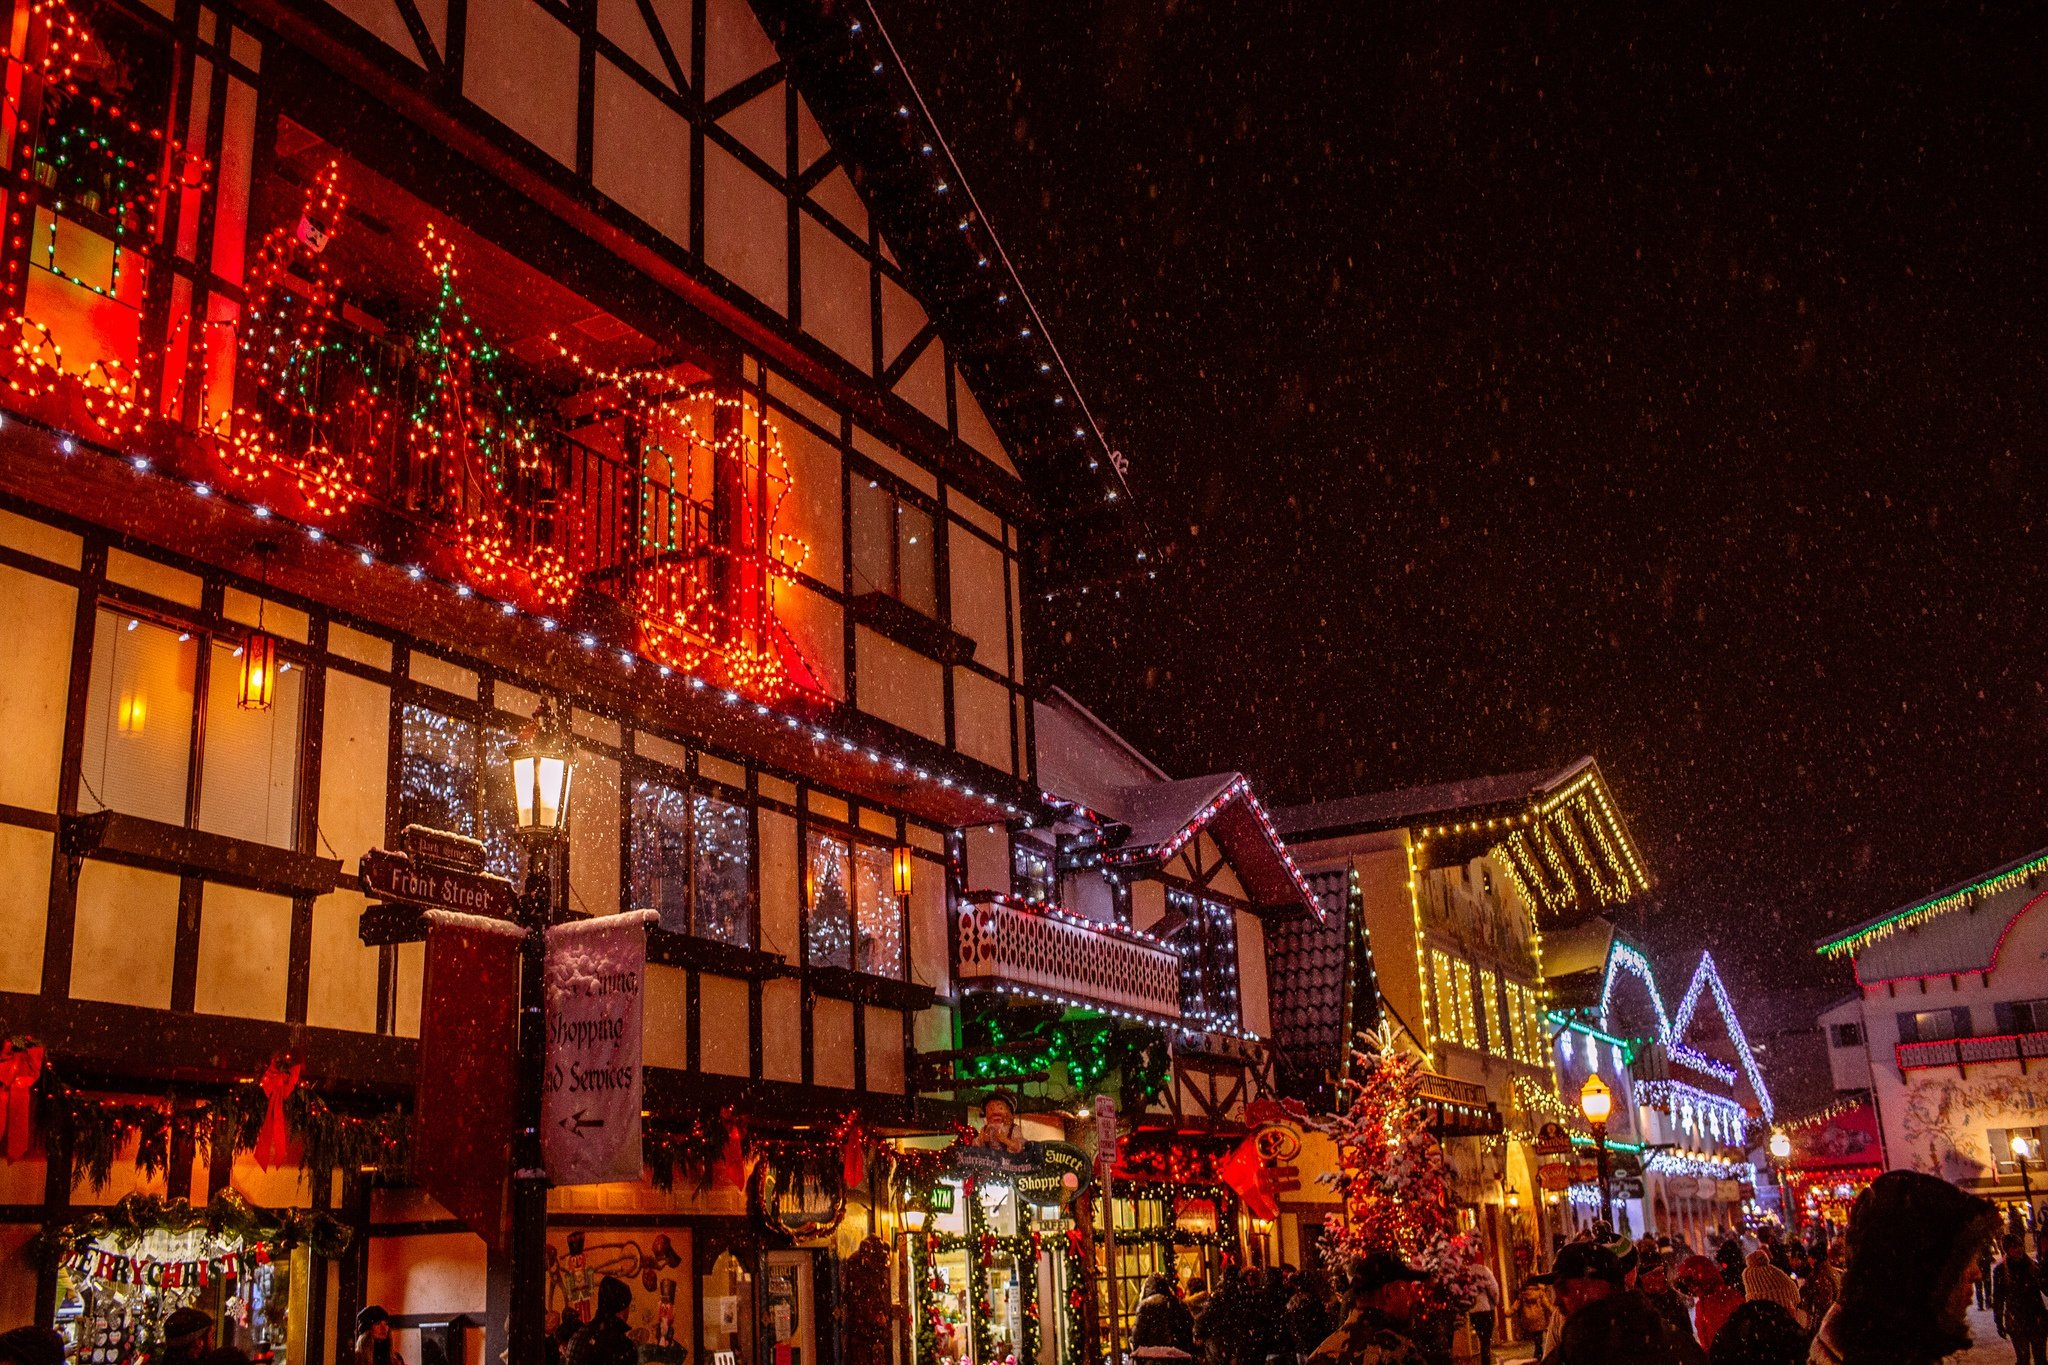 Leavenworth Washington Christmas Market 2020 12 Festive Leavenworth Christmas Activities You'll Love (UPDATE 2019)